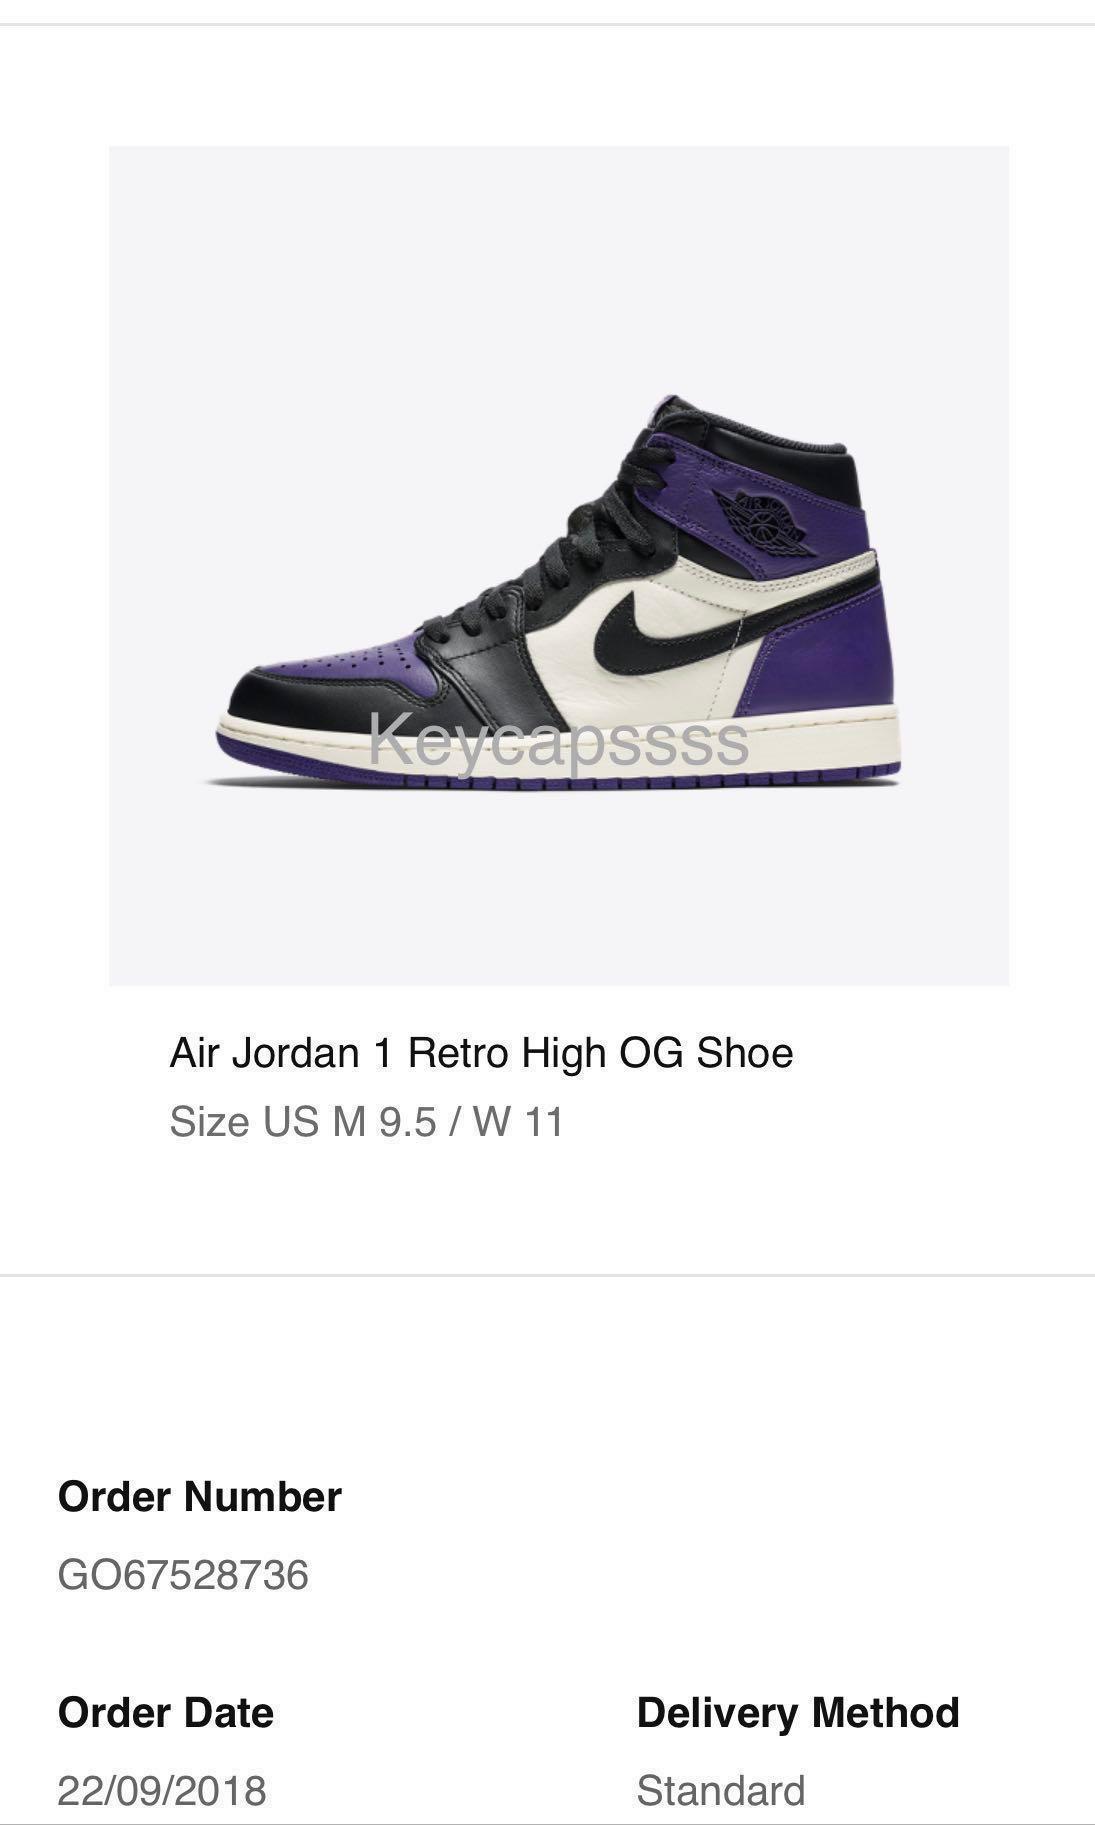 timeless design a9fa6 6cb84  US9.5  Nike Air Jordan 1 Court Purple., Men s Fashion, Footwear, Sneakers  on Carousell